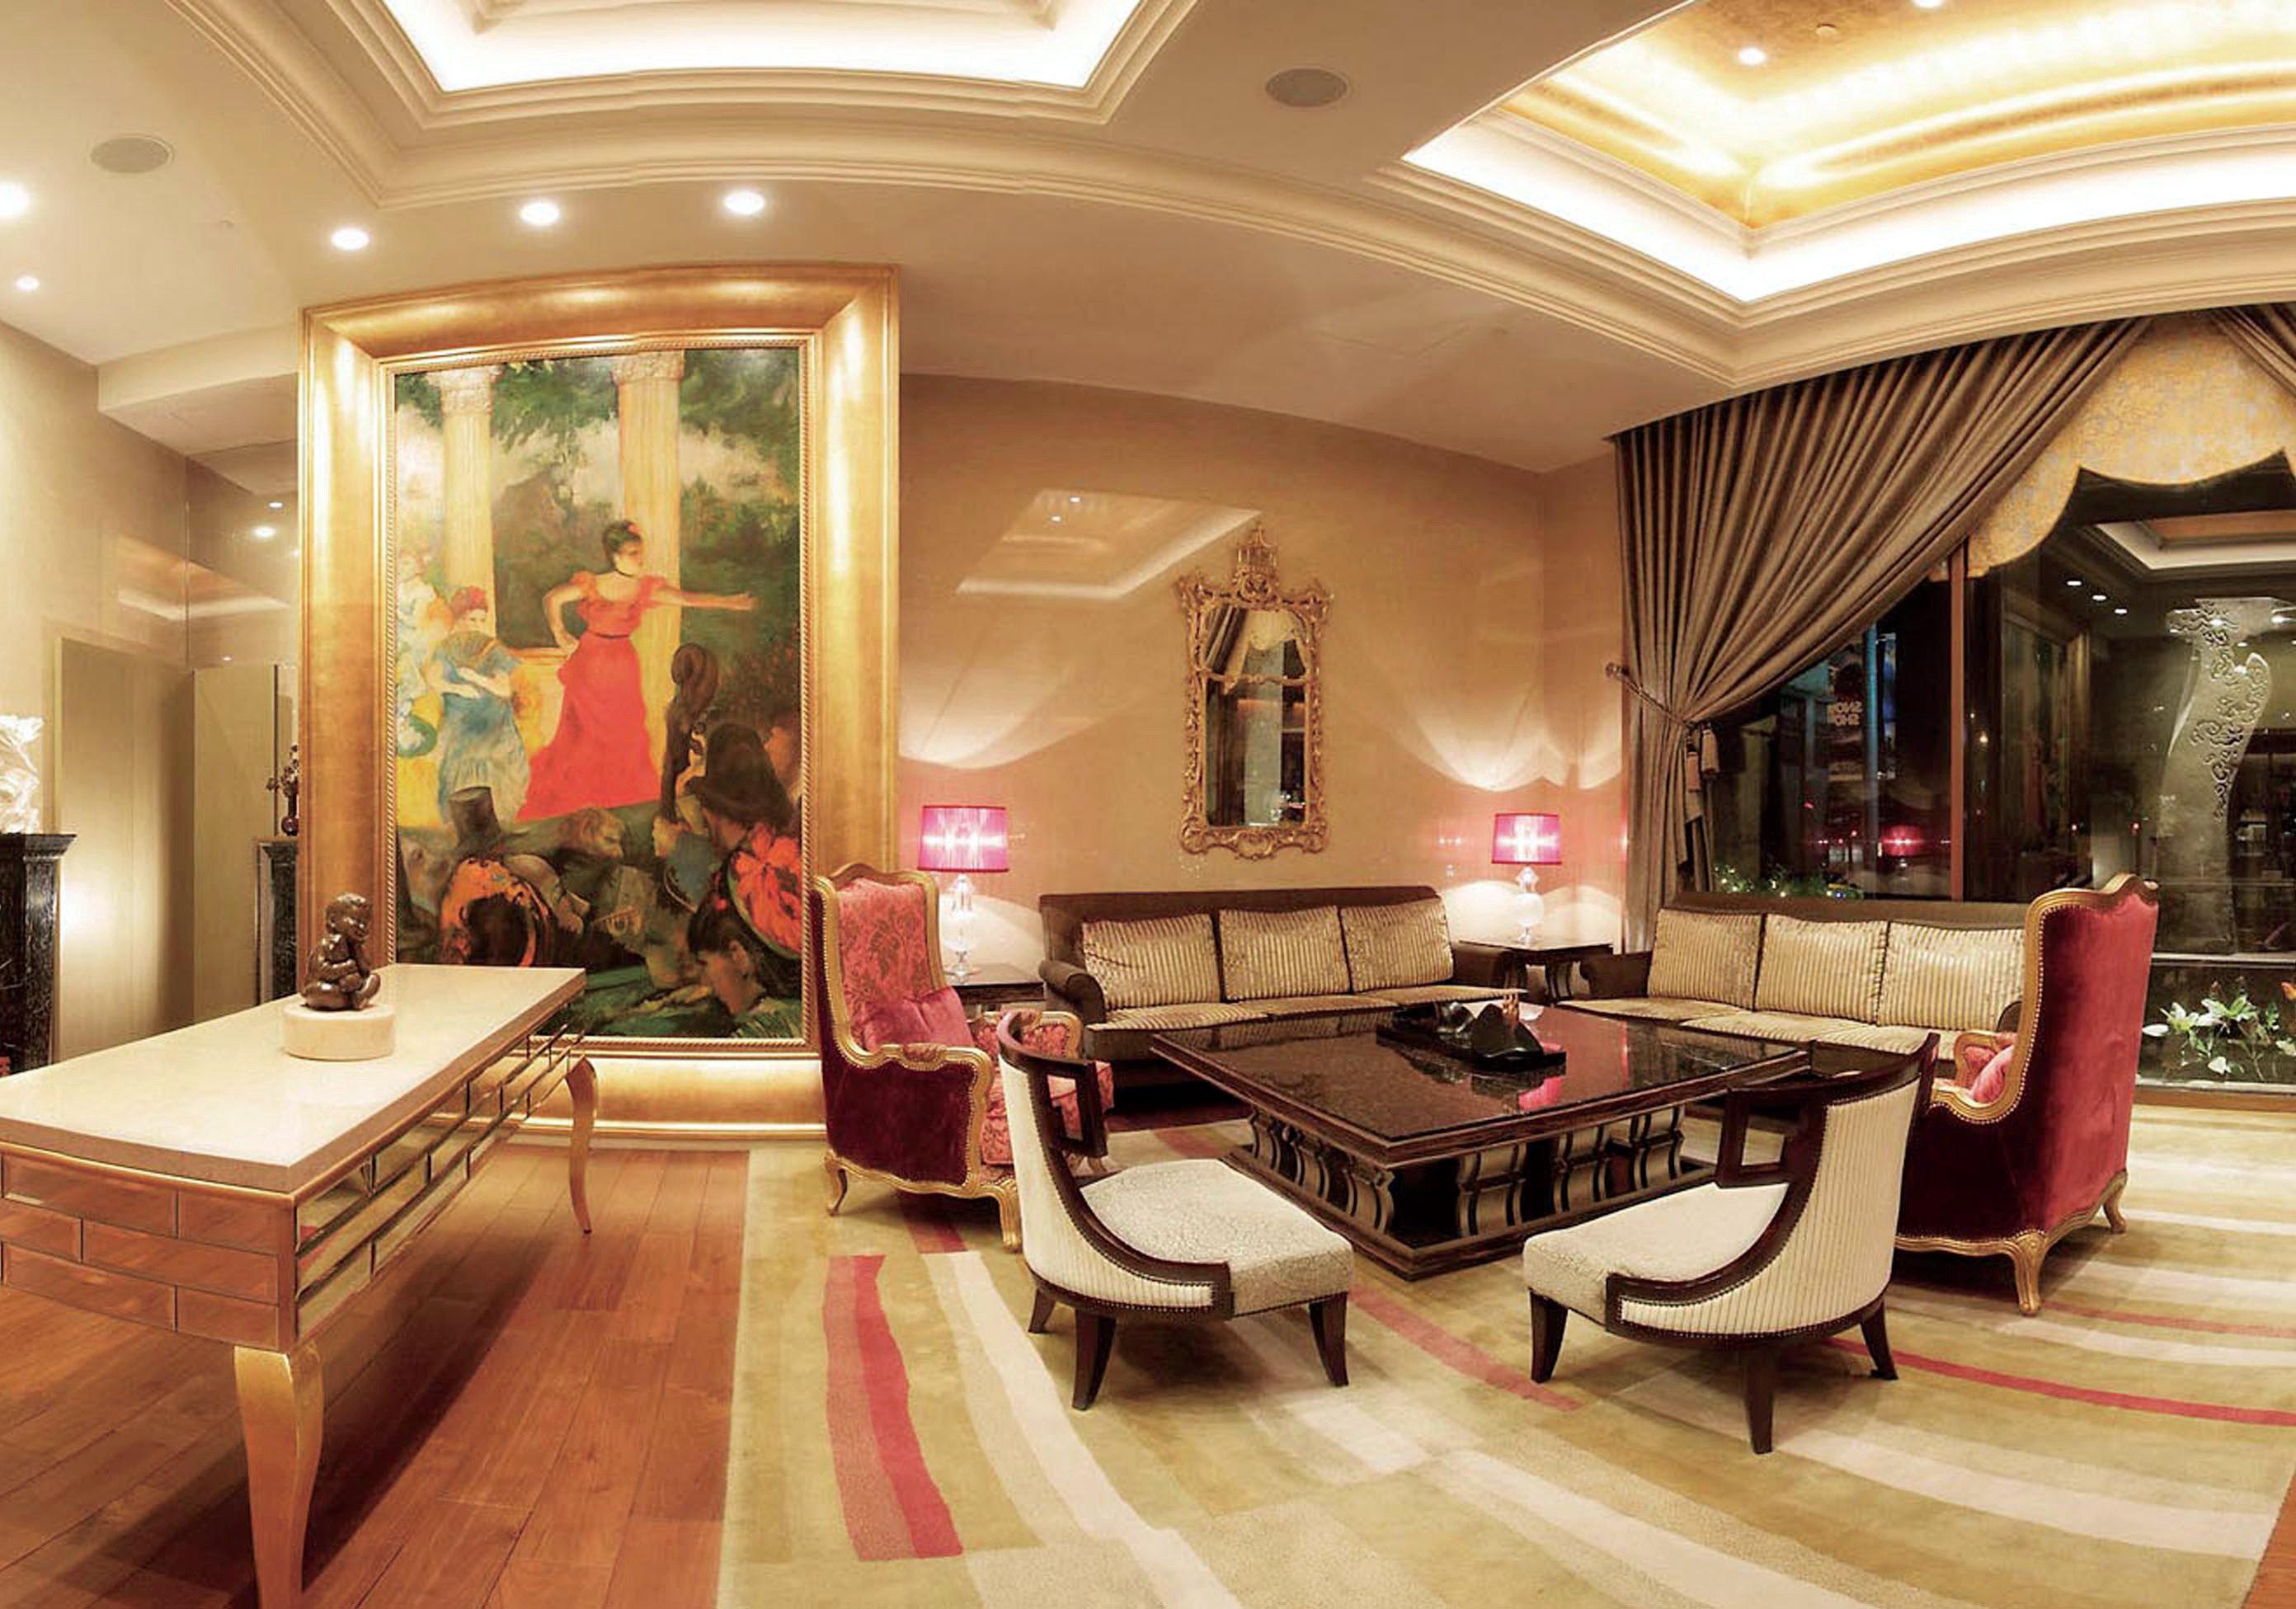 Lobby recreation room living room home mansion restaurant Boutique Bedroom